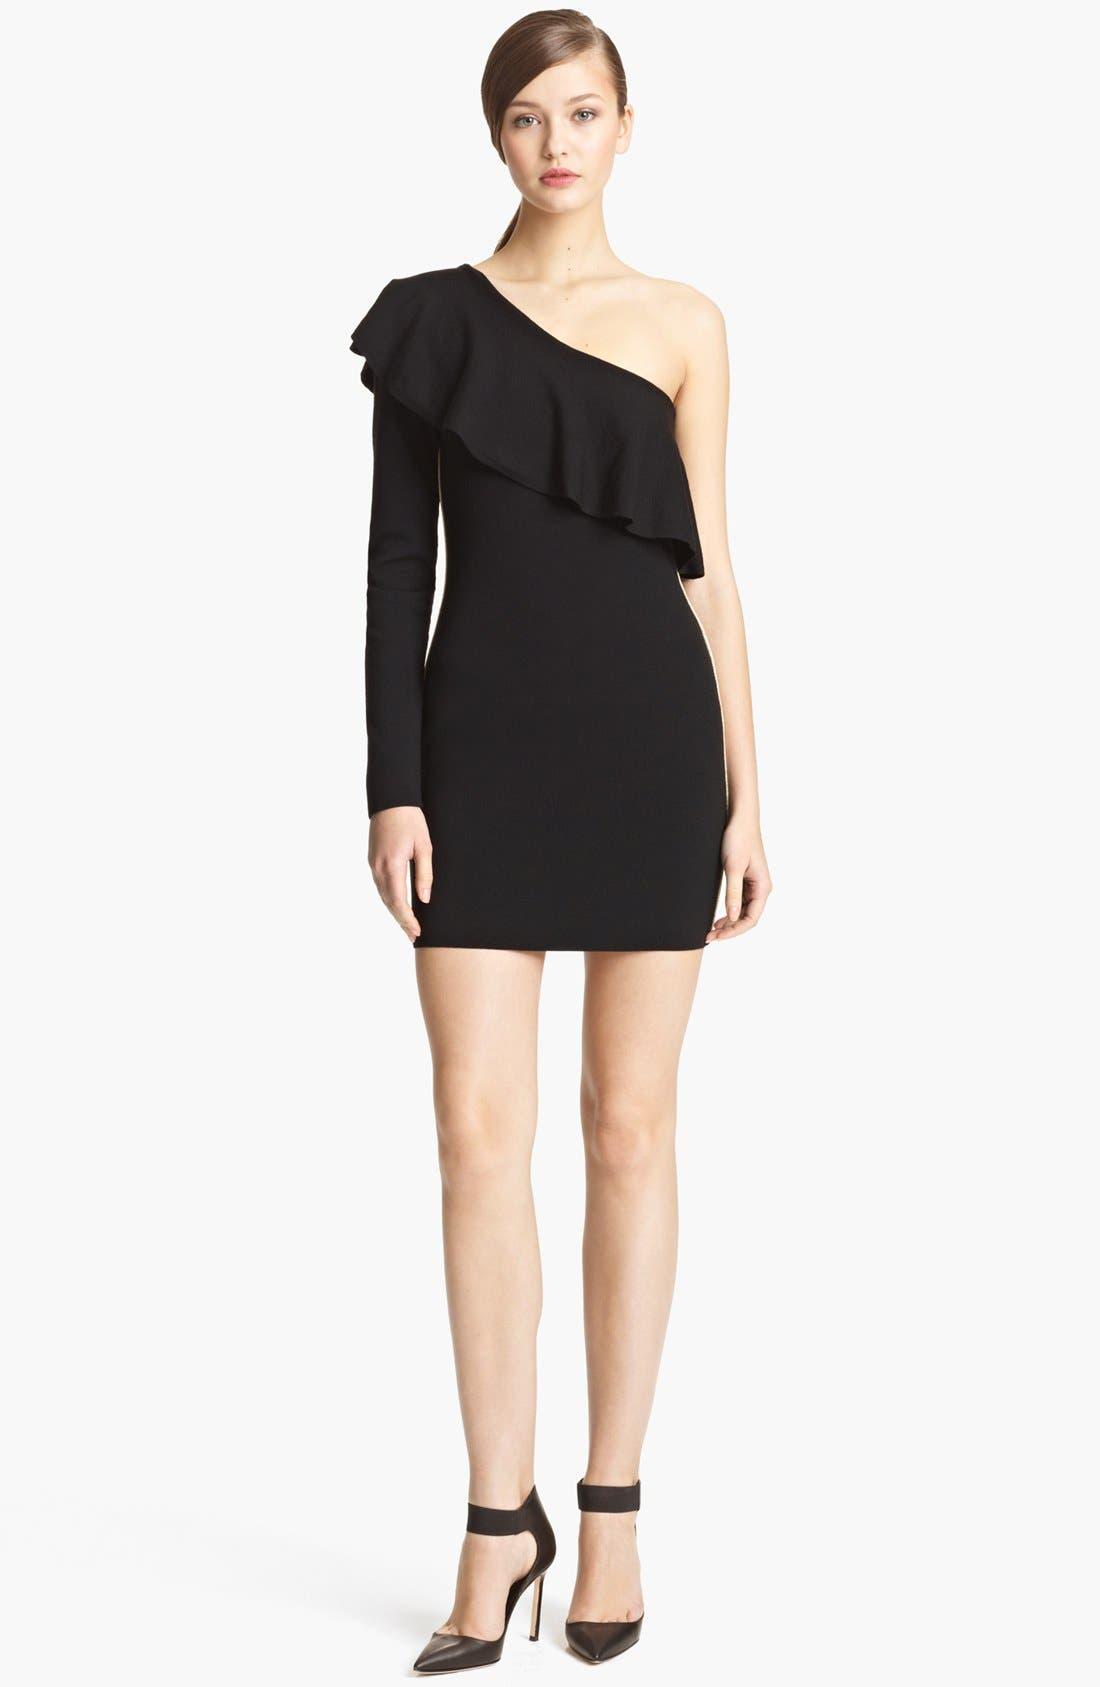 Alternate Image 1 Selected - Emilio Pucci Ruffle One-Shoulder Sheath Dress